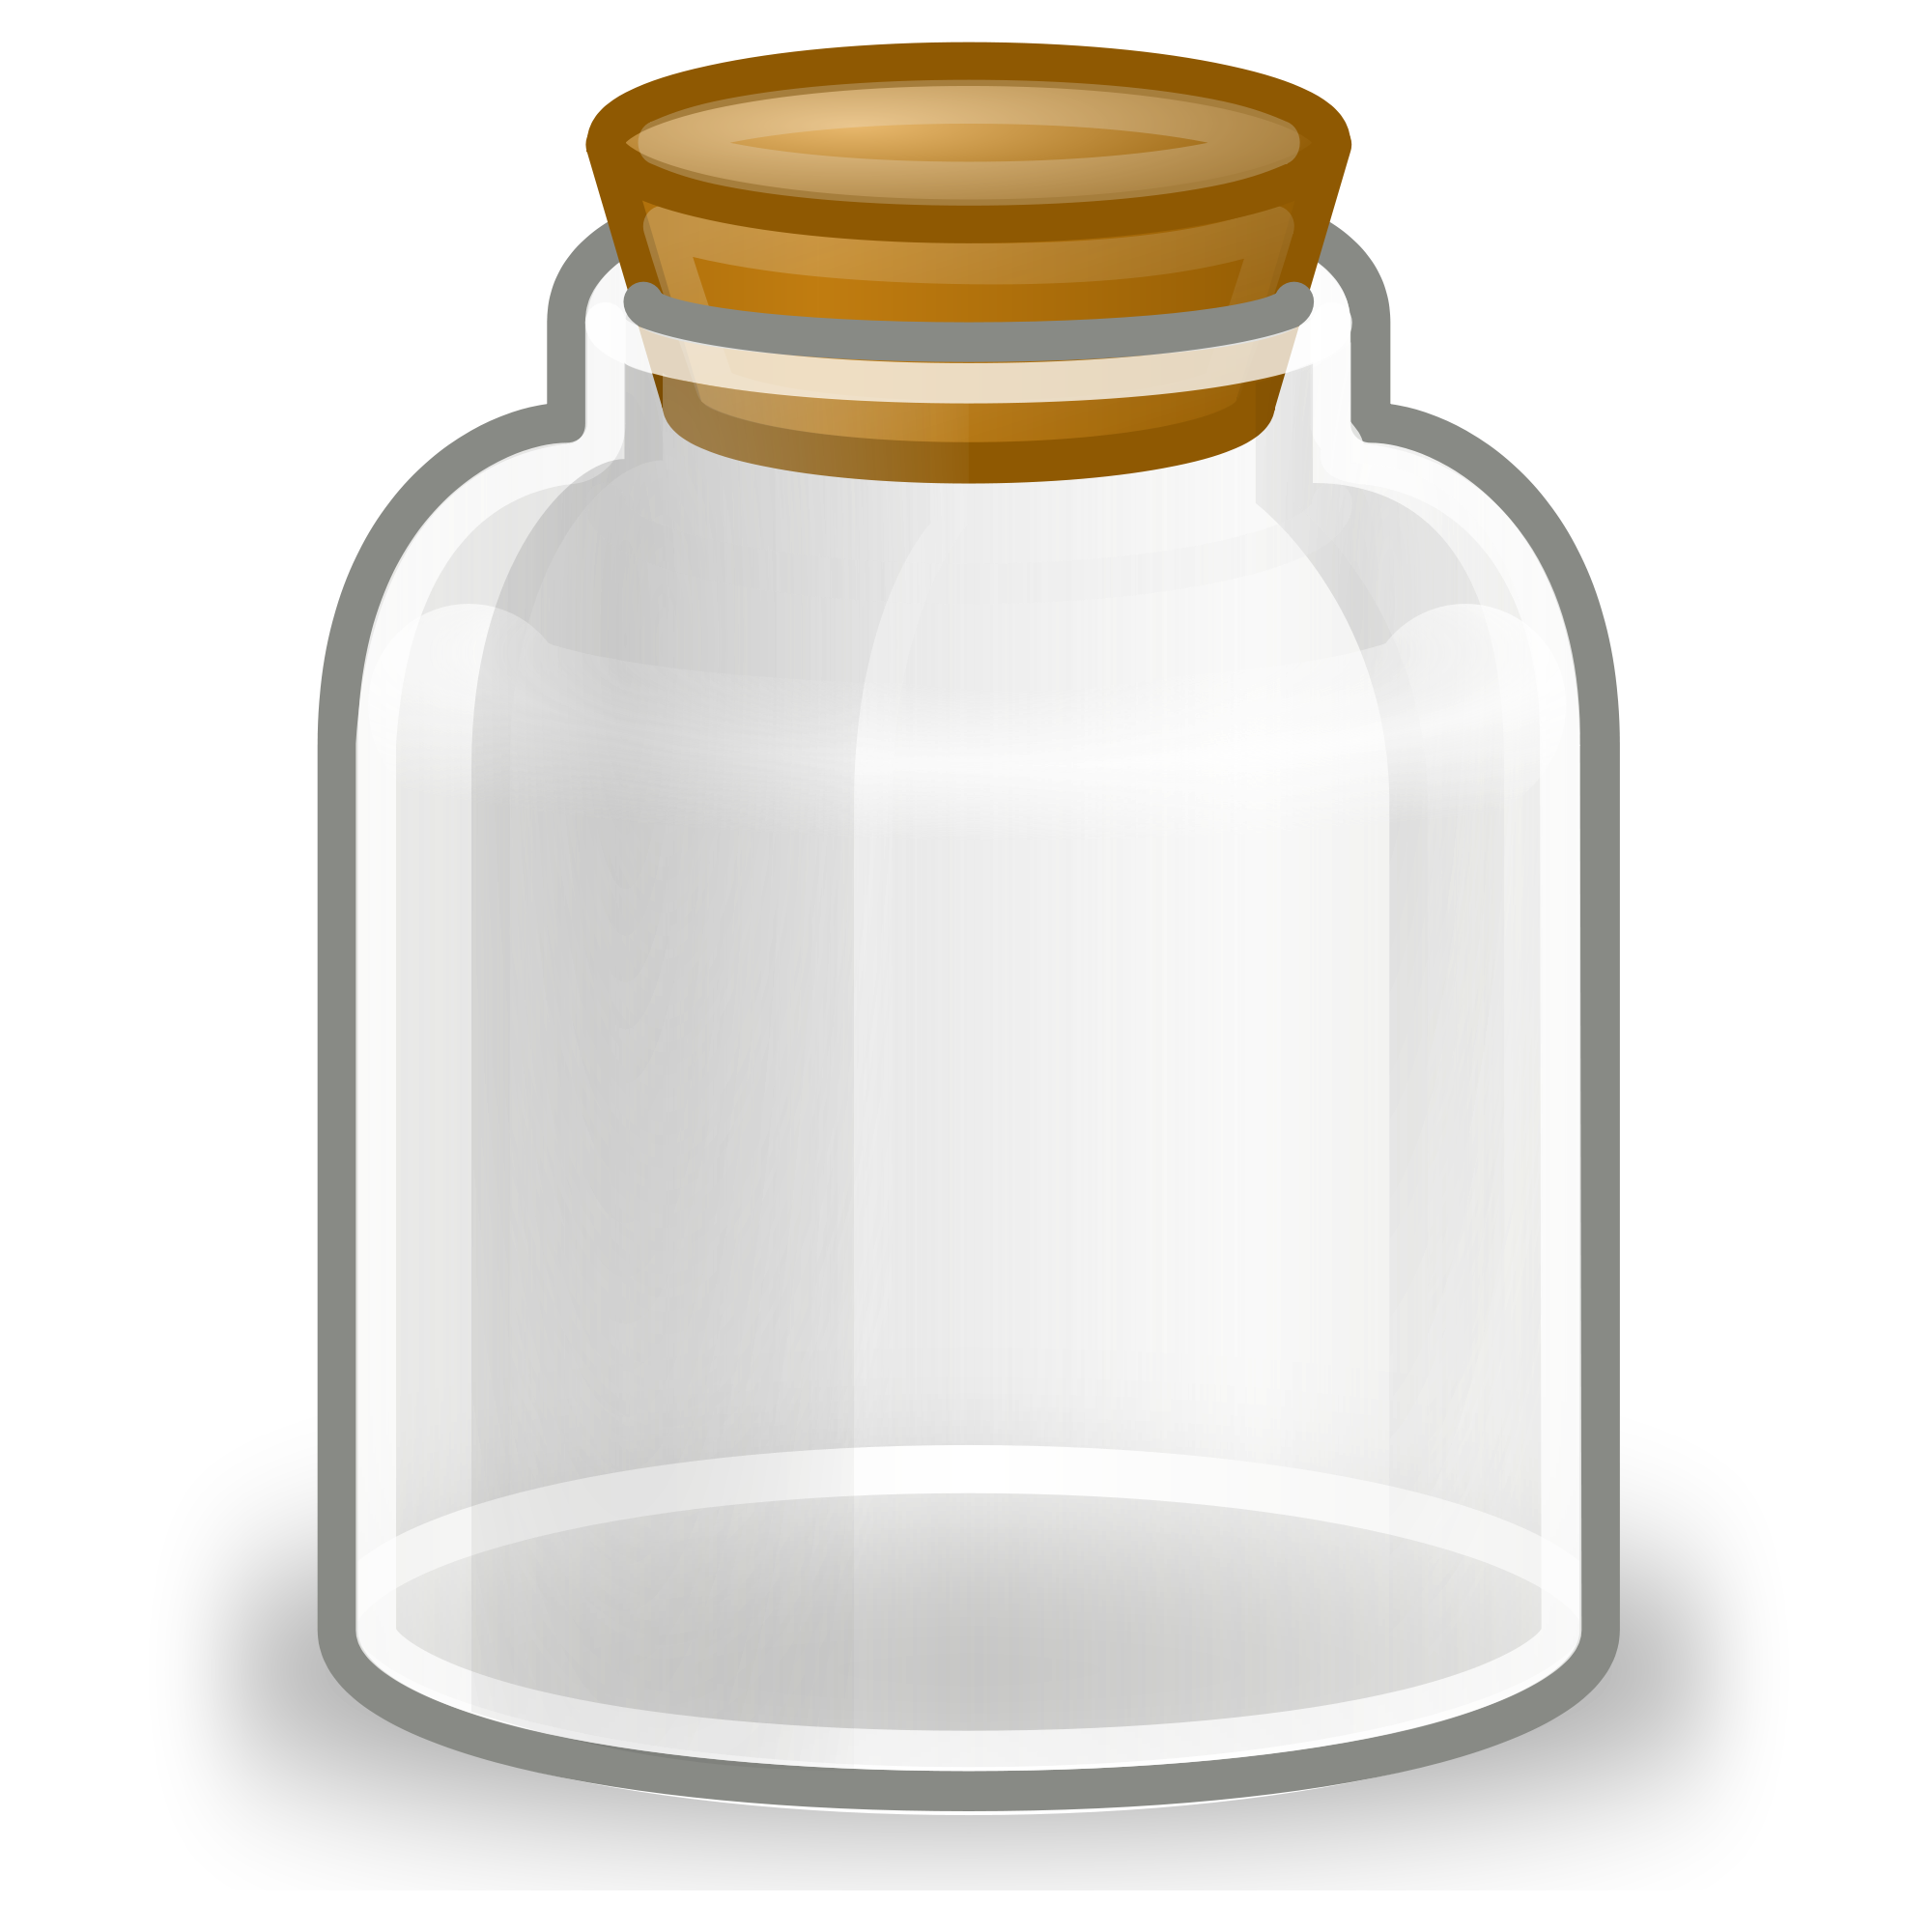 jar png transparent jarpng images pluspng